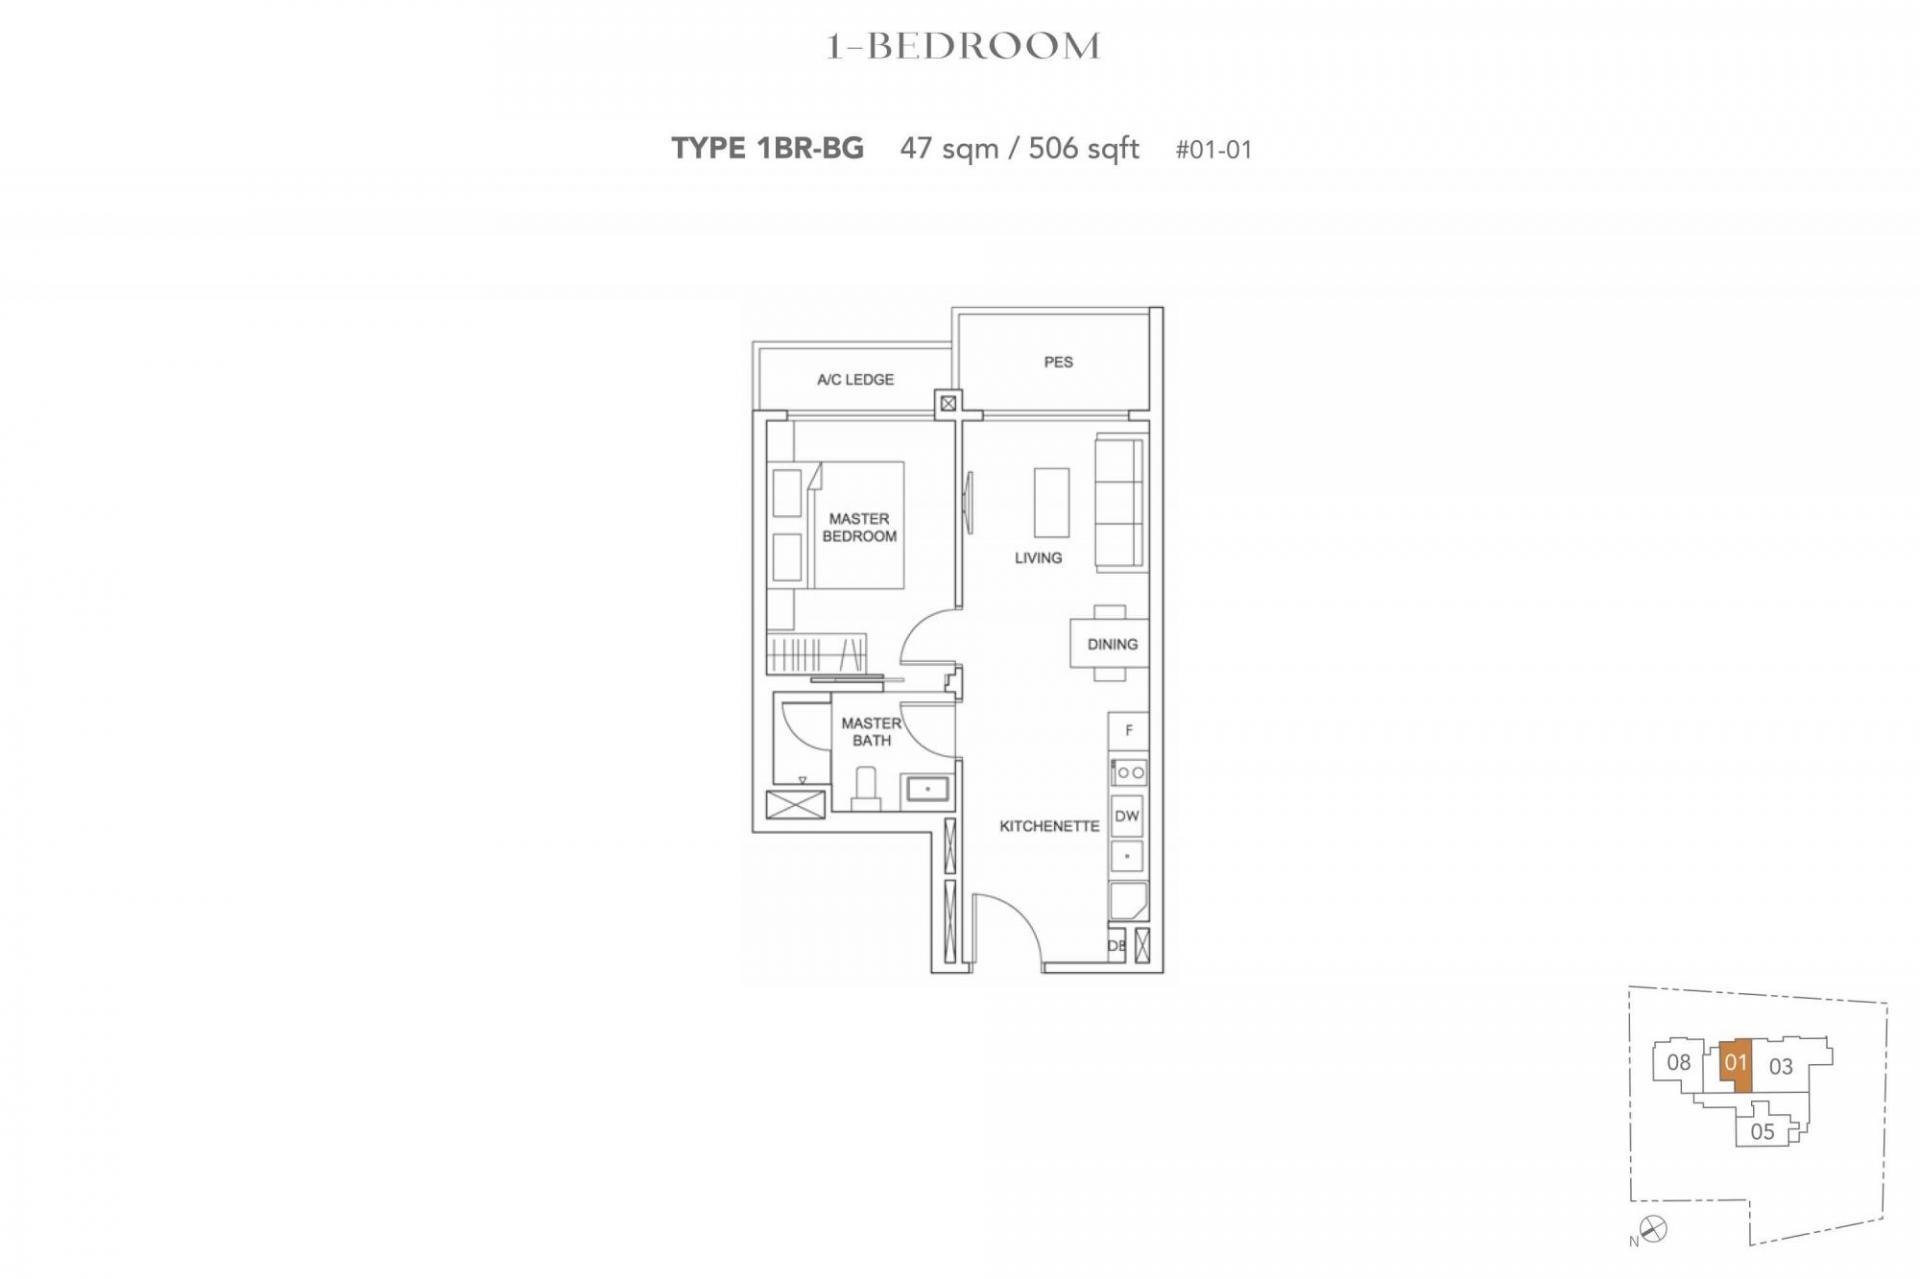 jervois-treasures-floor-plan-singapore